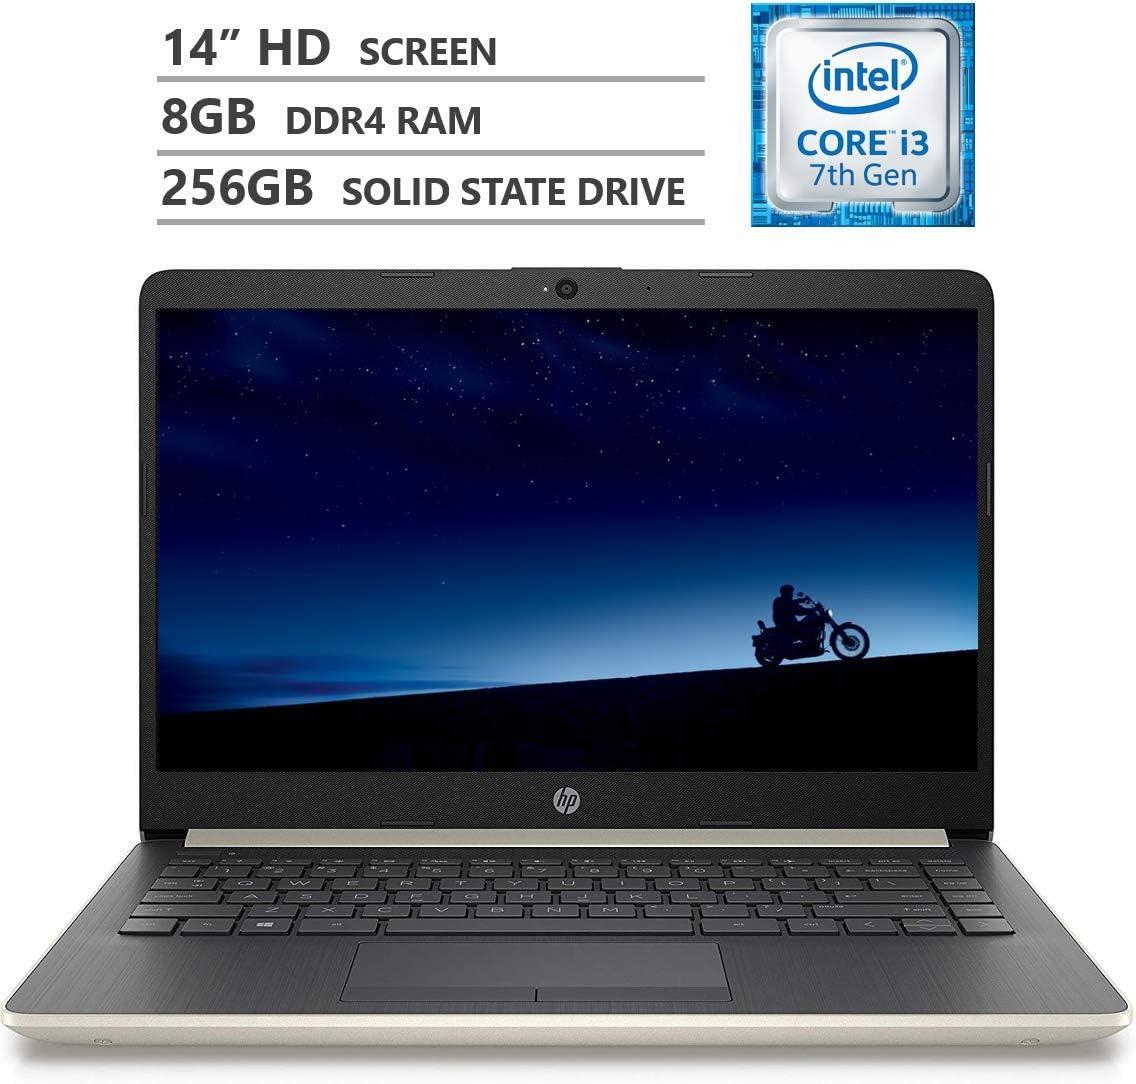 "HP Notebook 14"" HD WLED-Backlit Screen Laptop, Intel Core i3-7100U 2.40GHz Dual-Core Processor, 8GB Memory, 256GB M.2 Solid State Drive, HDMI, 802.11 b/g/n, Bluetooth 4.2, Windows 10 Home, Pale Gold"